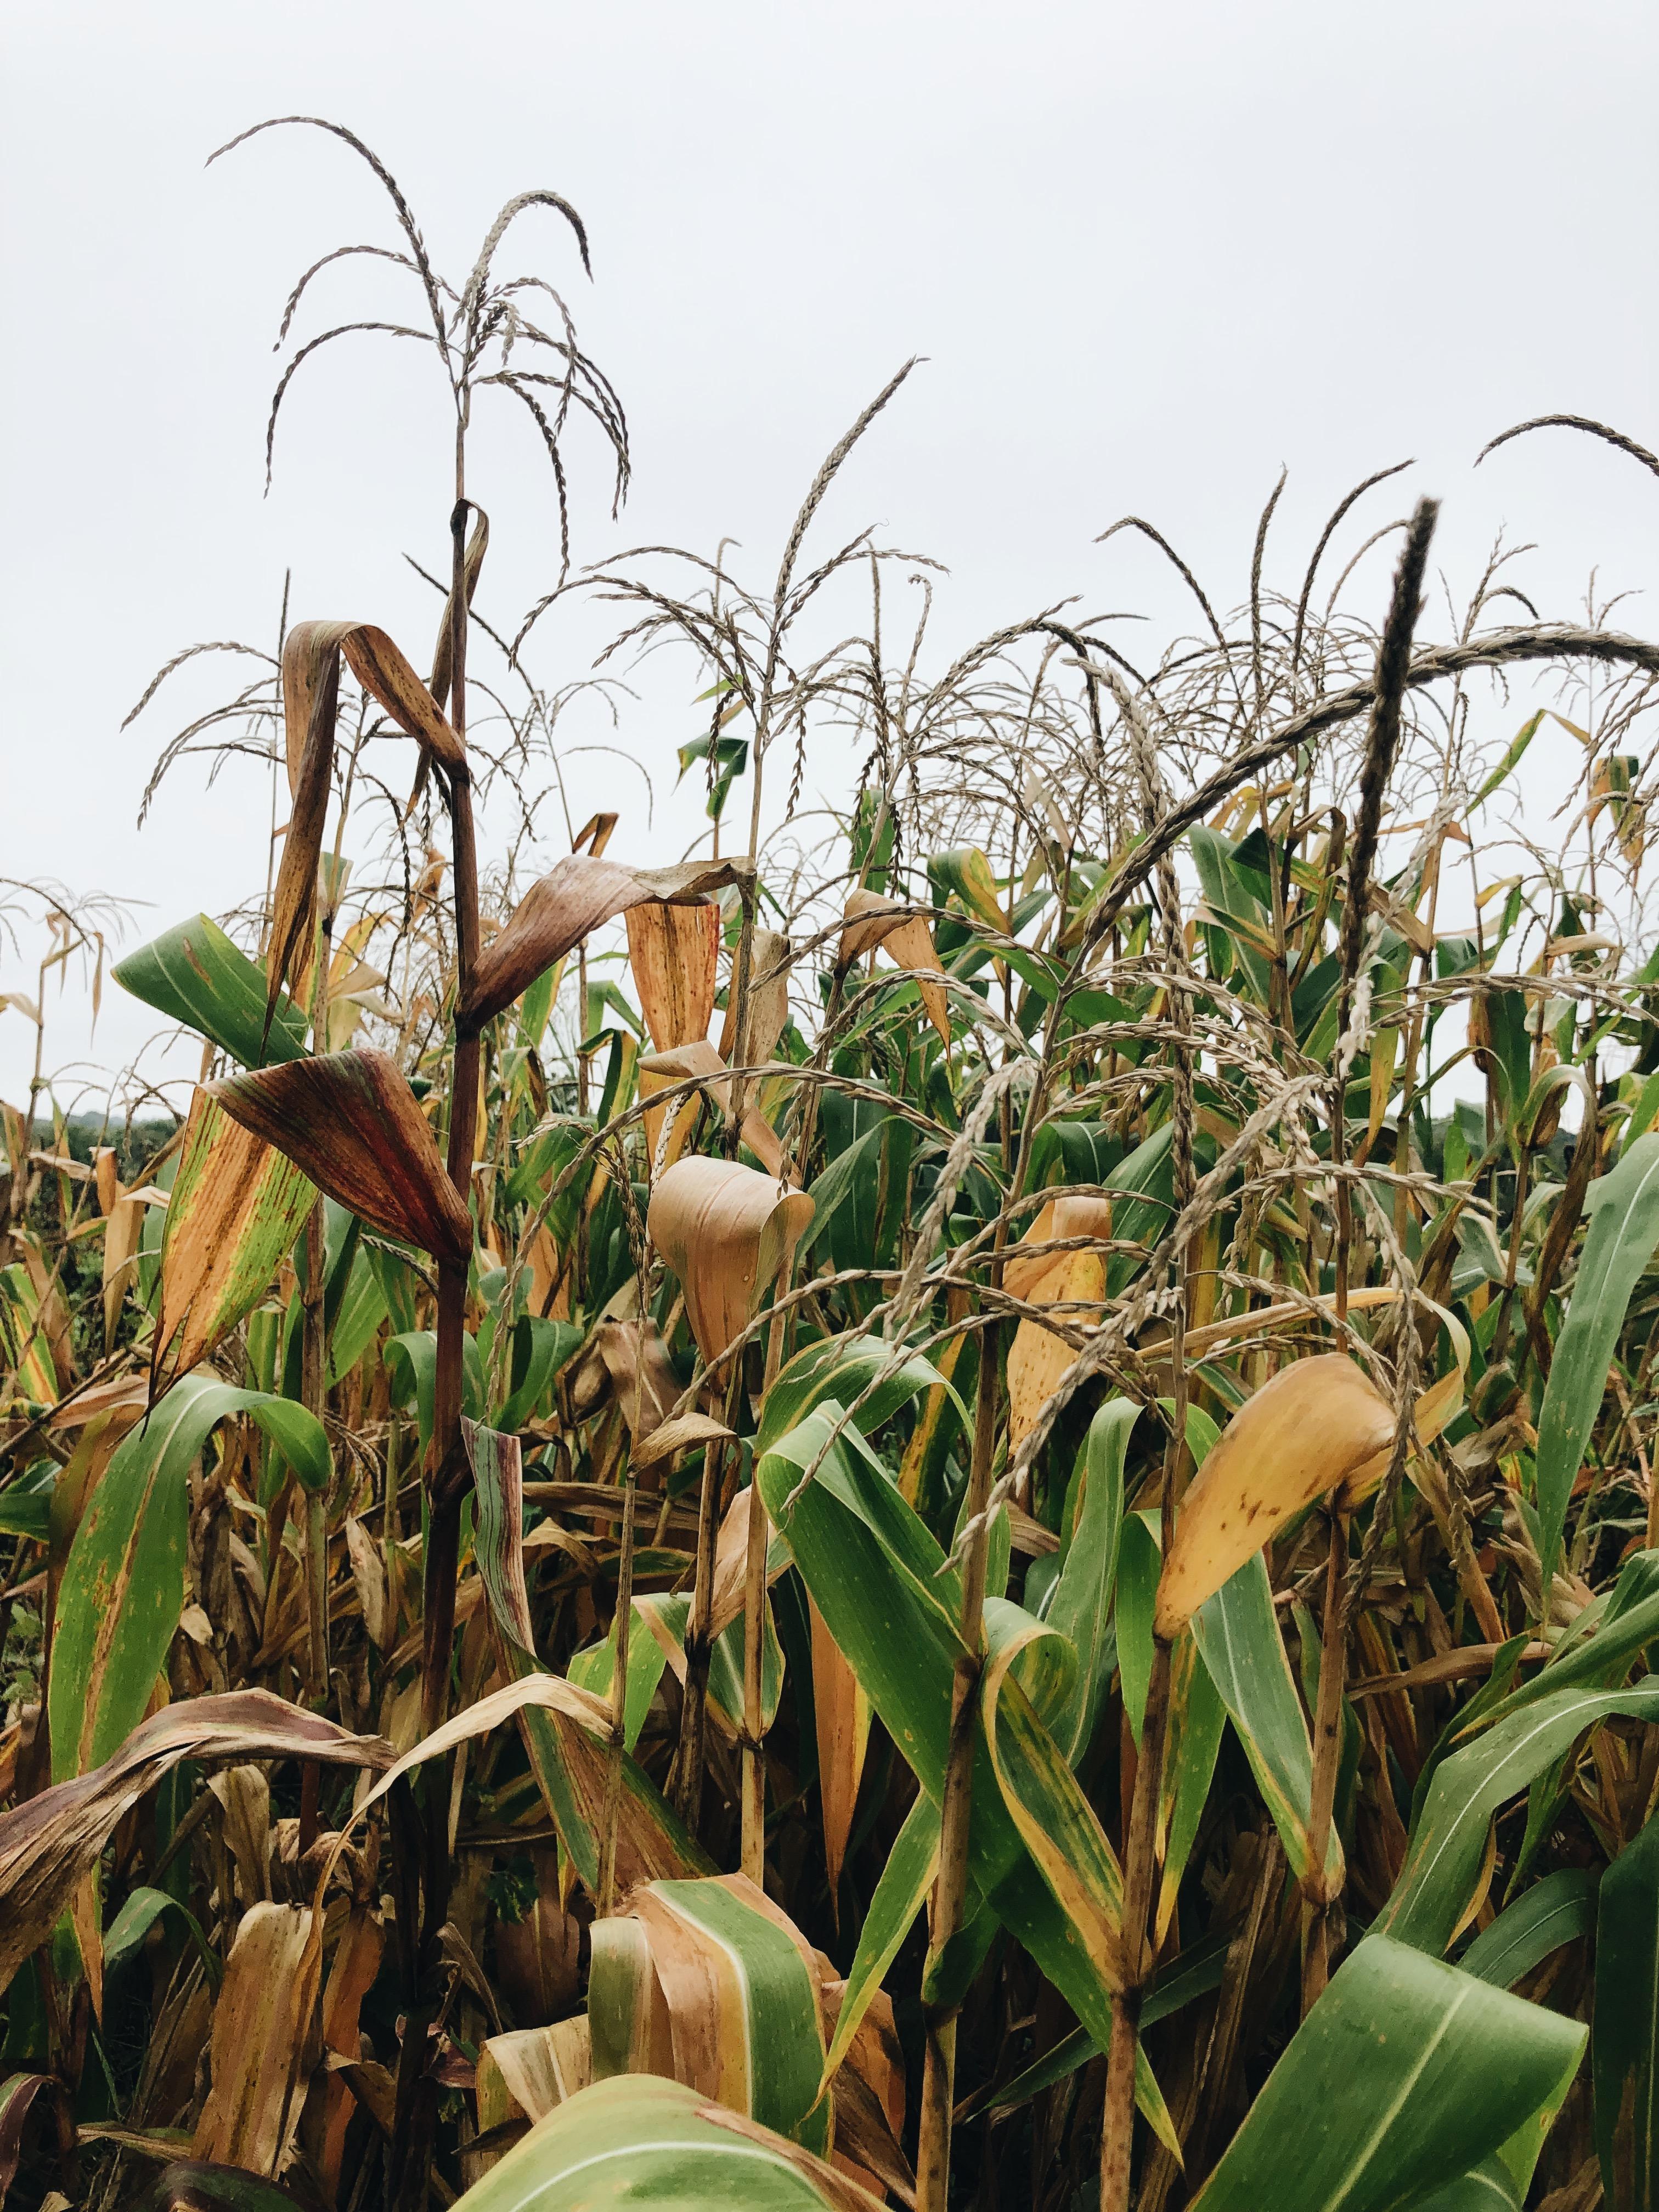 creepy corn field